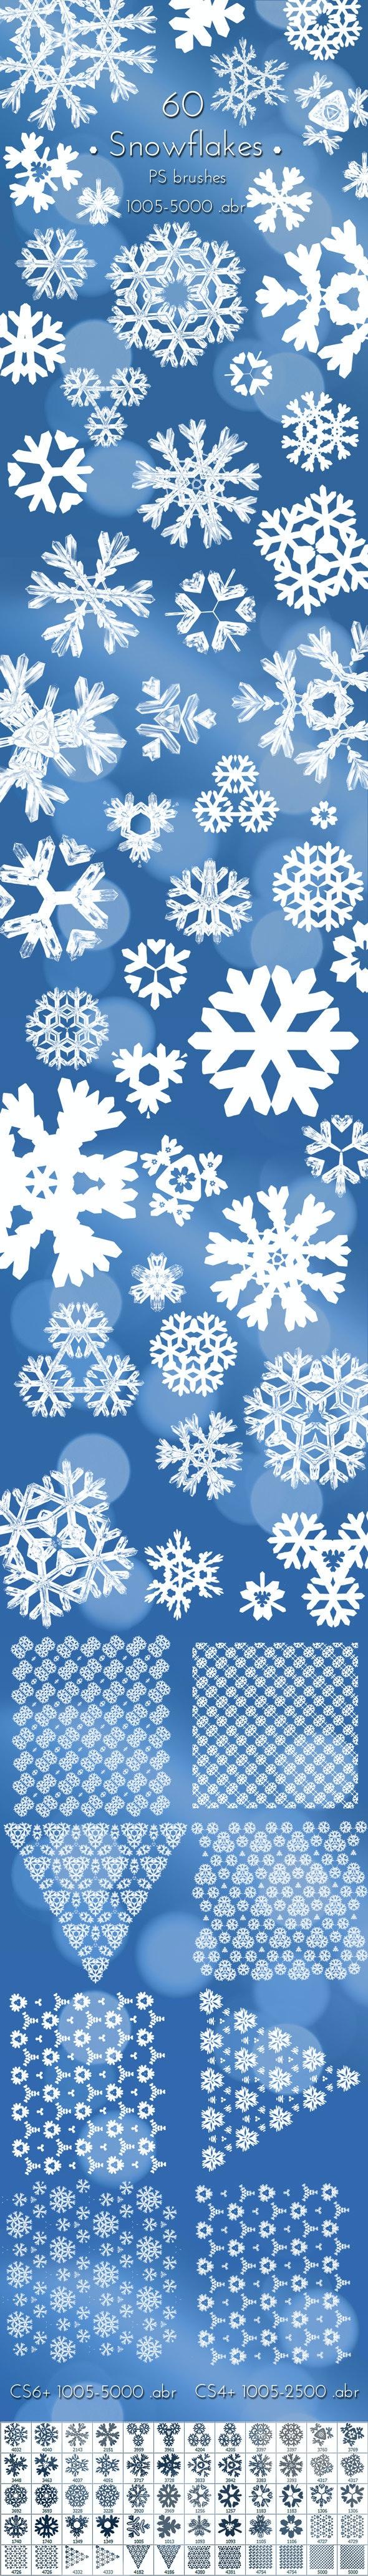 Christmas Snowflakes Brushes - Miscellaneous Brushes